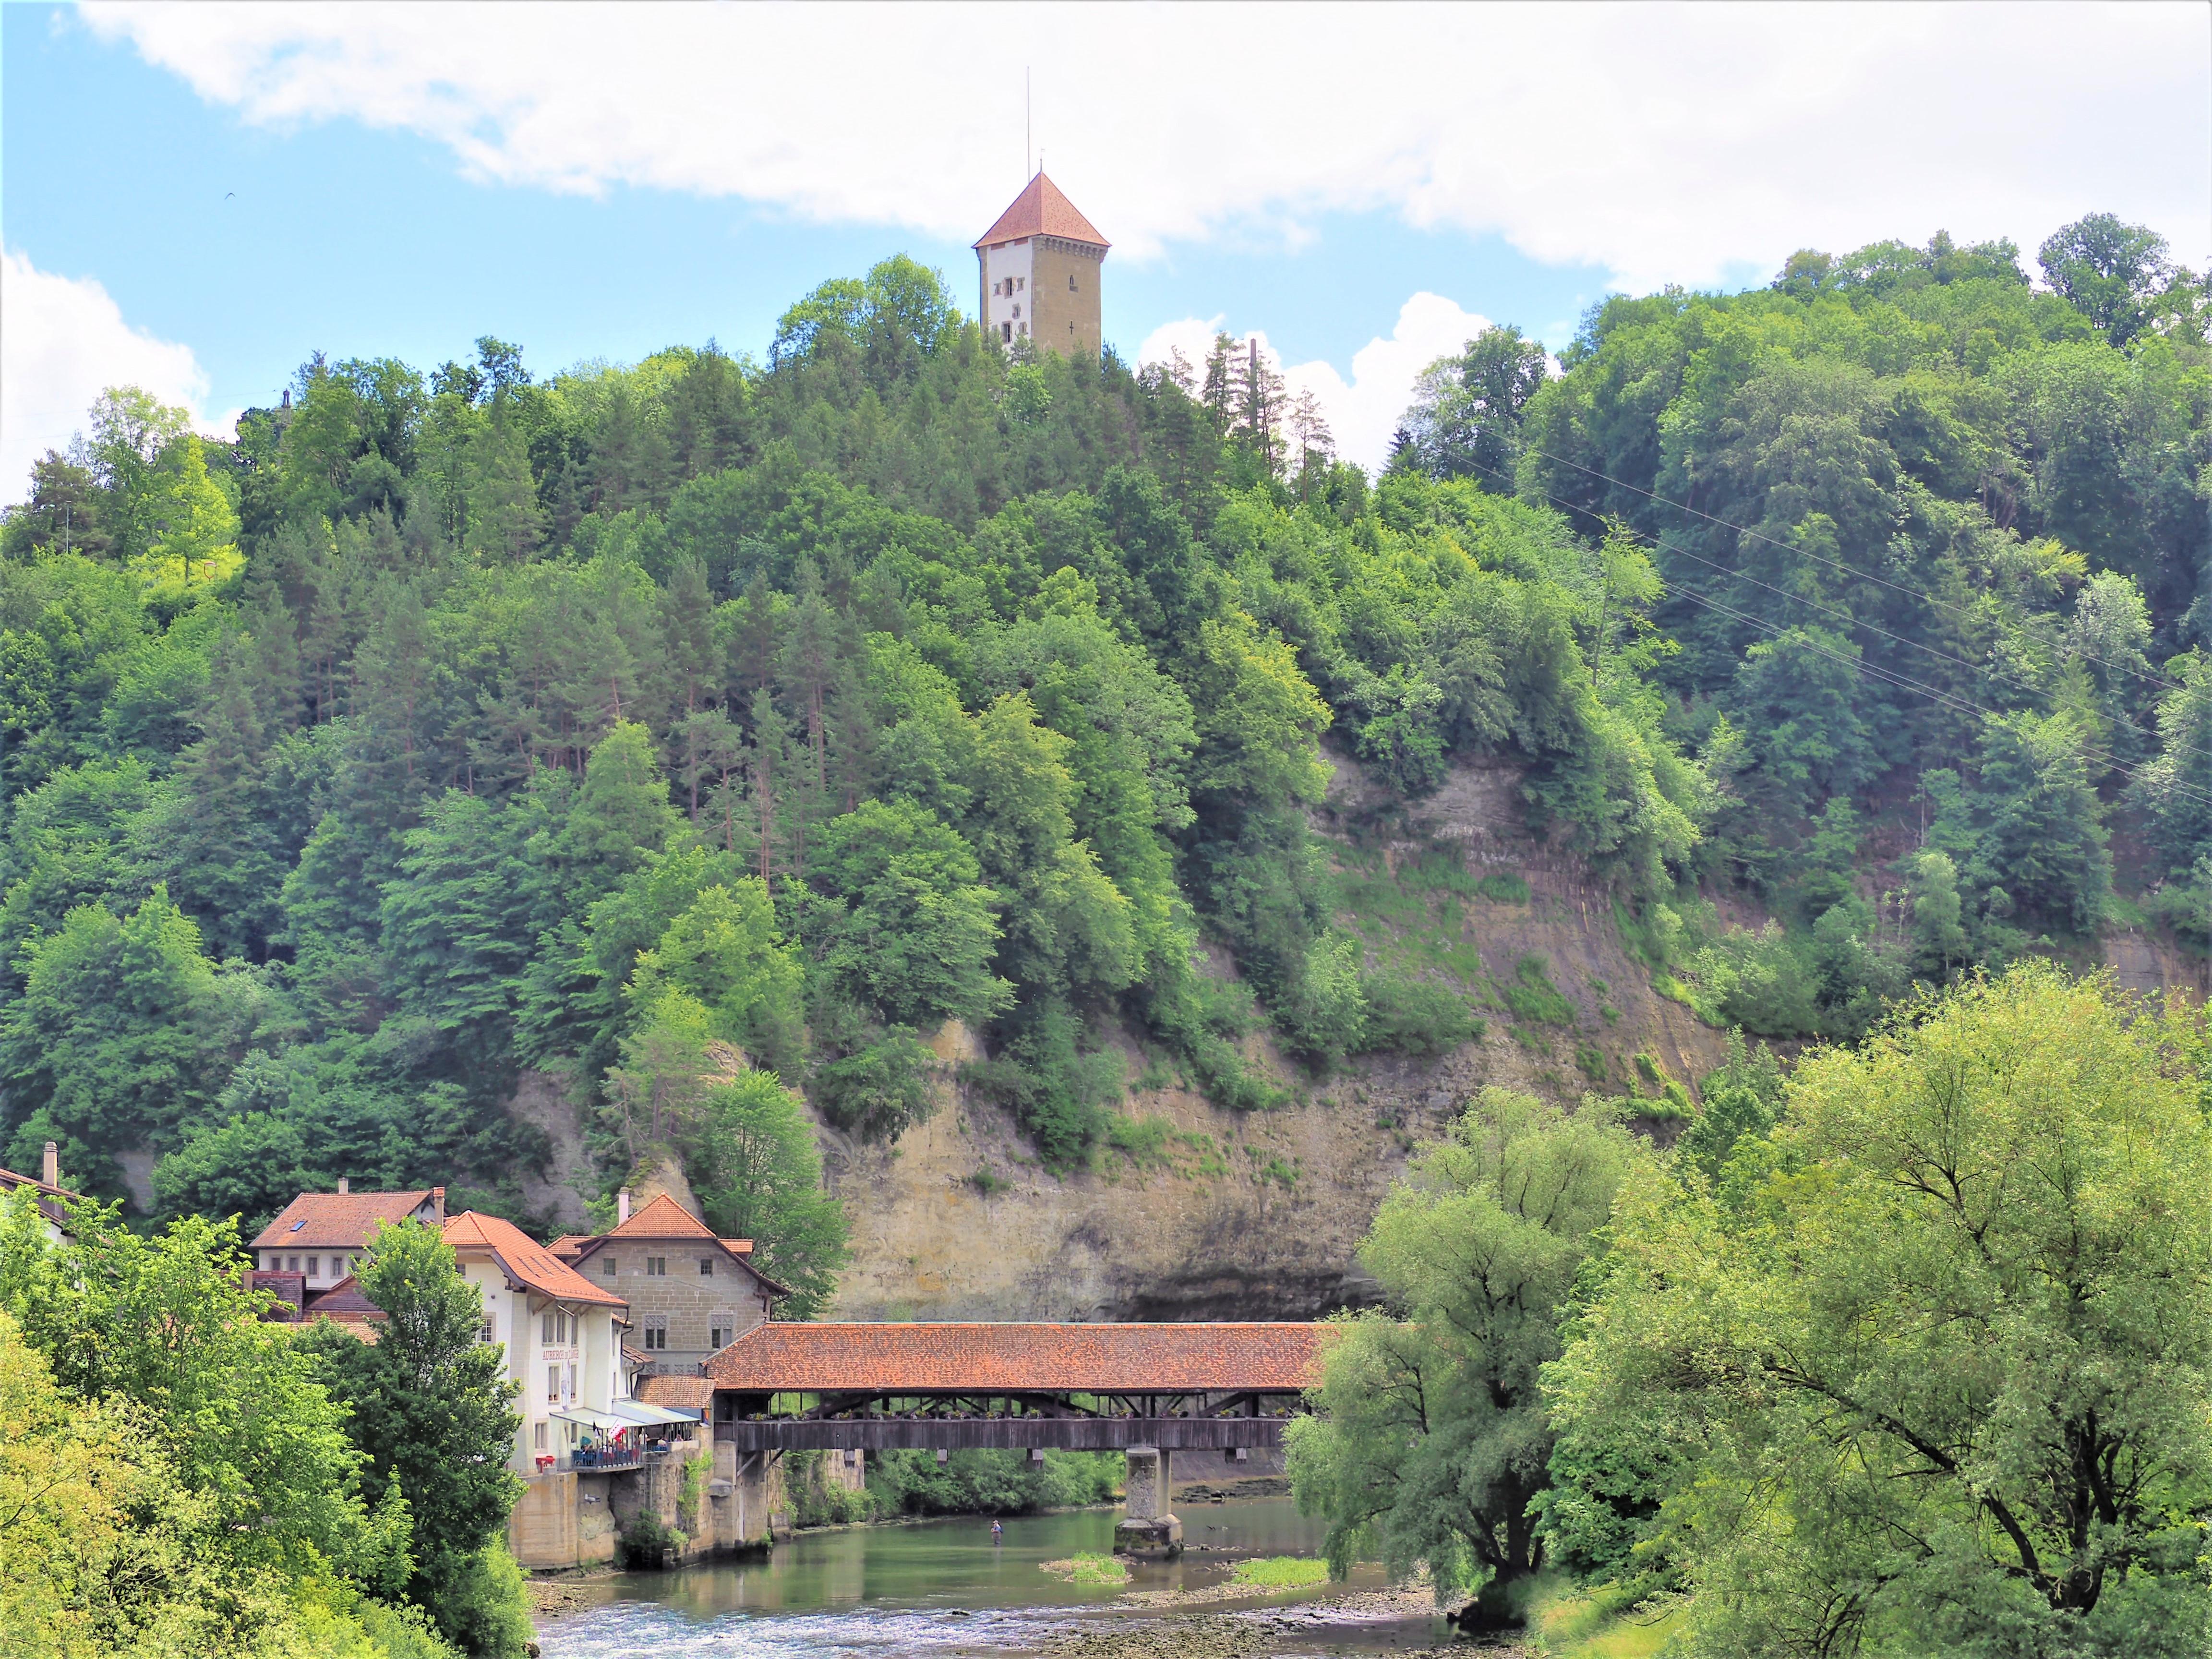 Fribourg Pont de Berne et porte